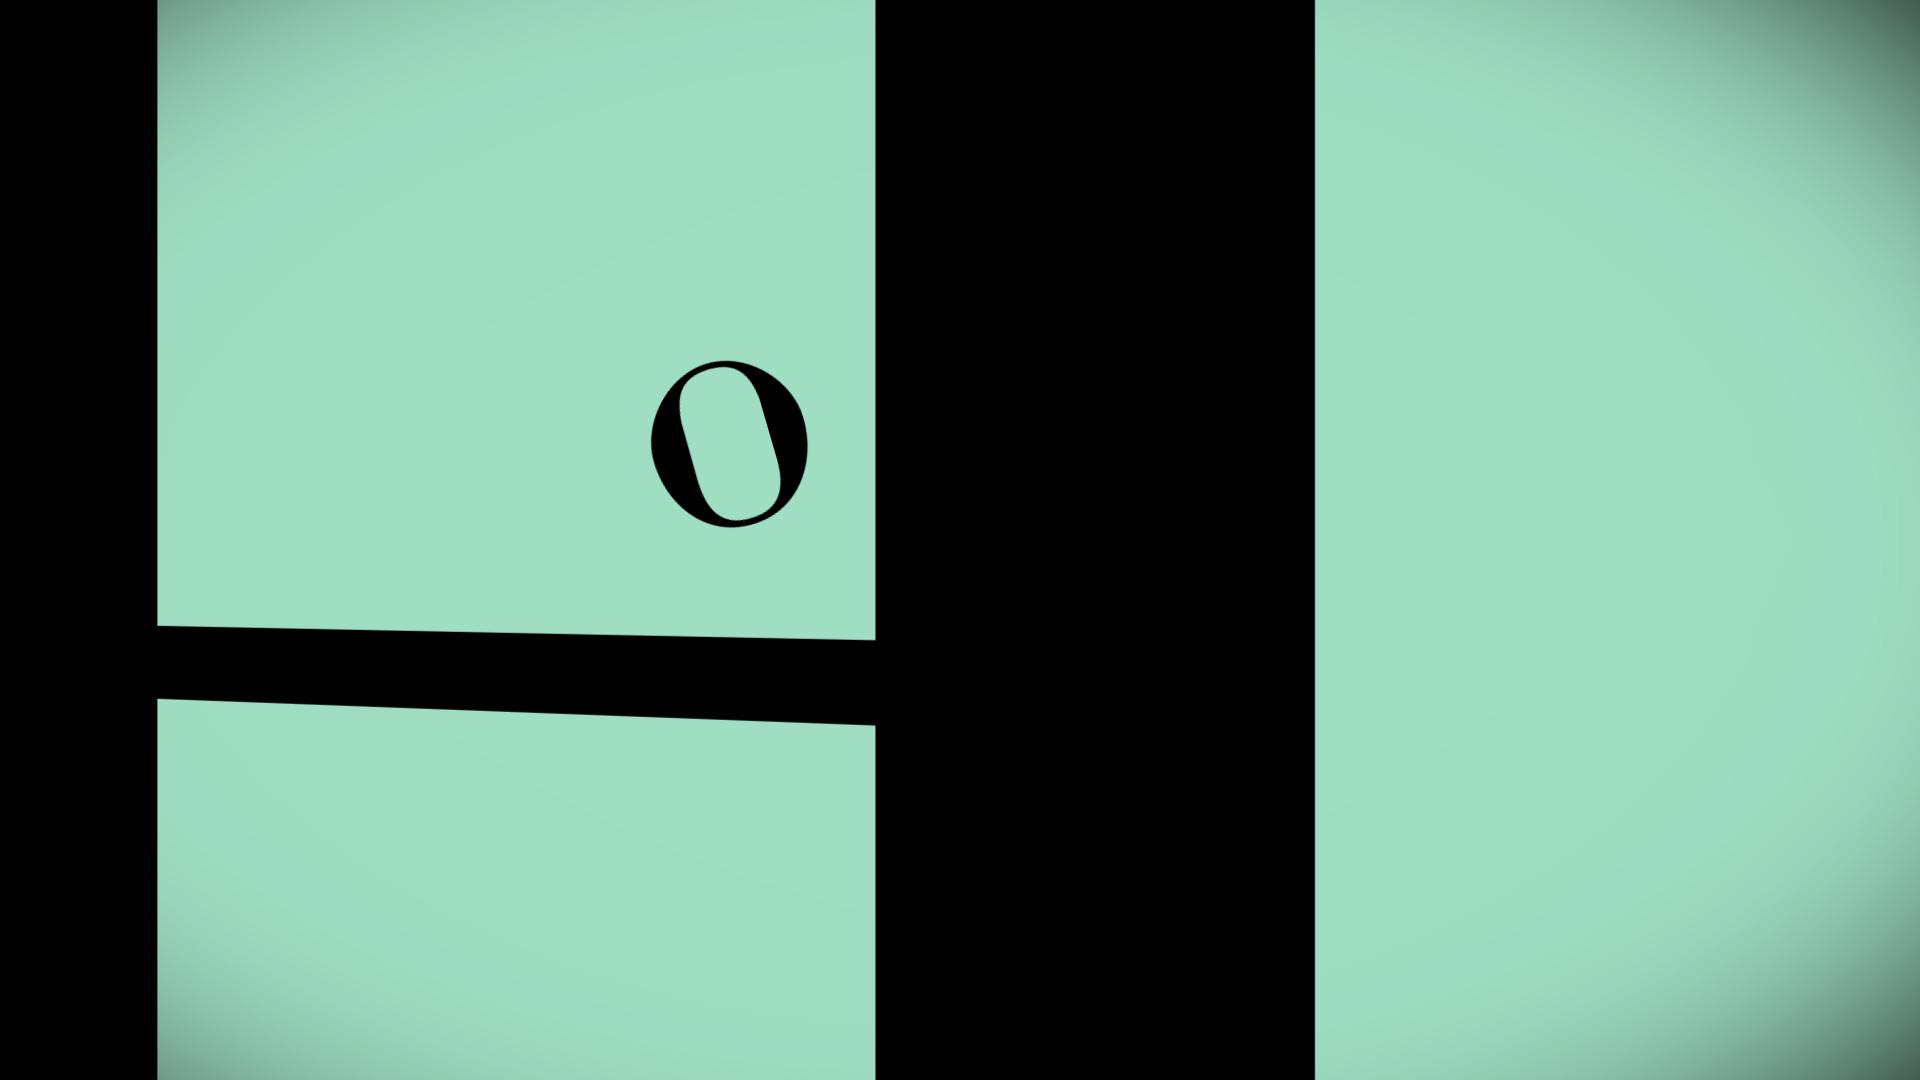 Totality (0.00.18.15).jpg